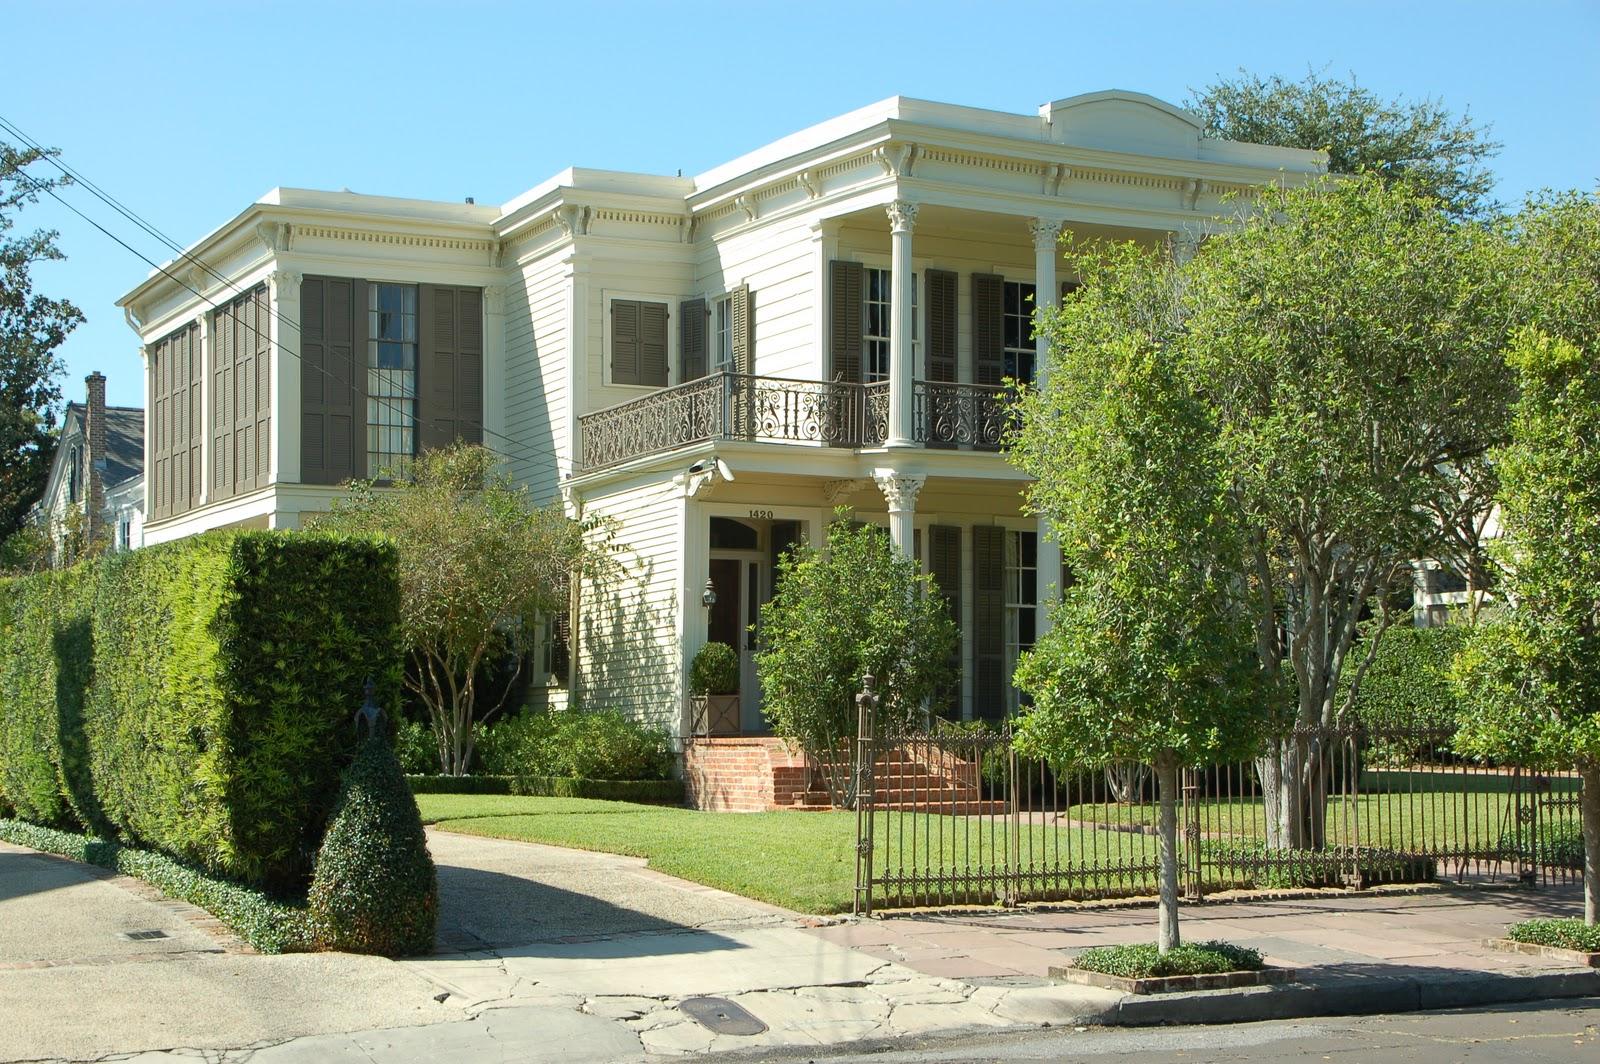 Drew Brees Mansion